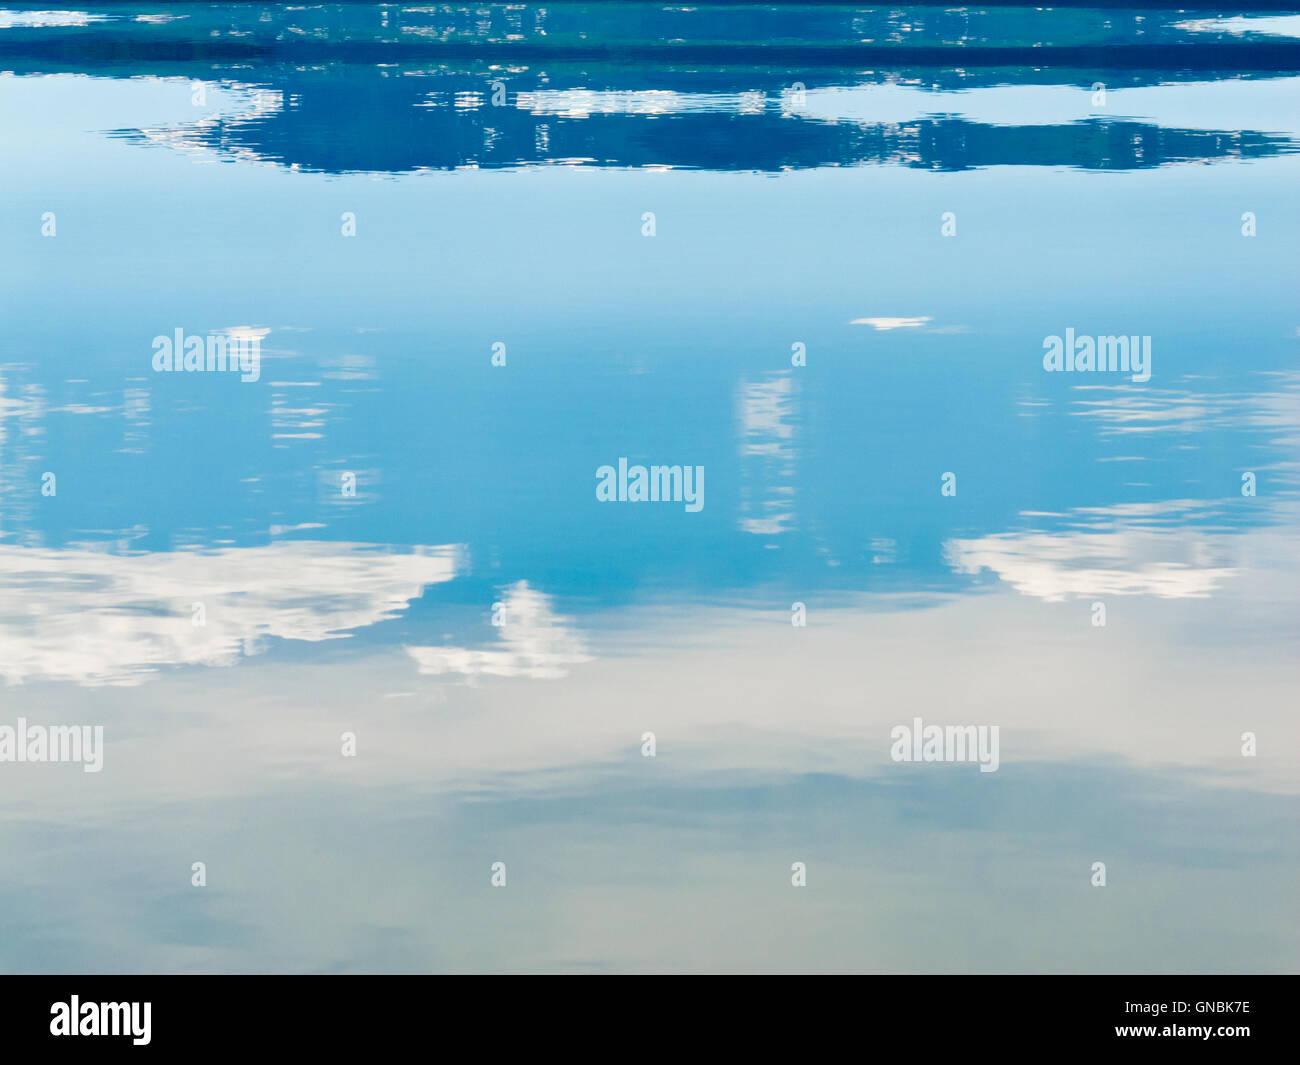 Superficie de agua paisaje reflejado Resumen Foto & Imagen De Stock ...